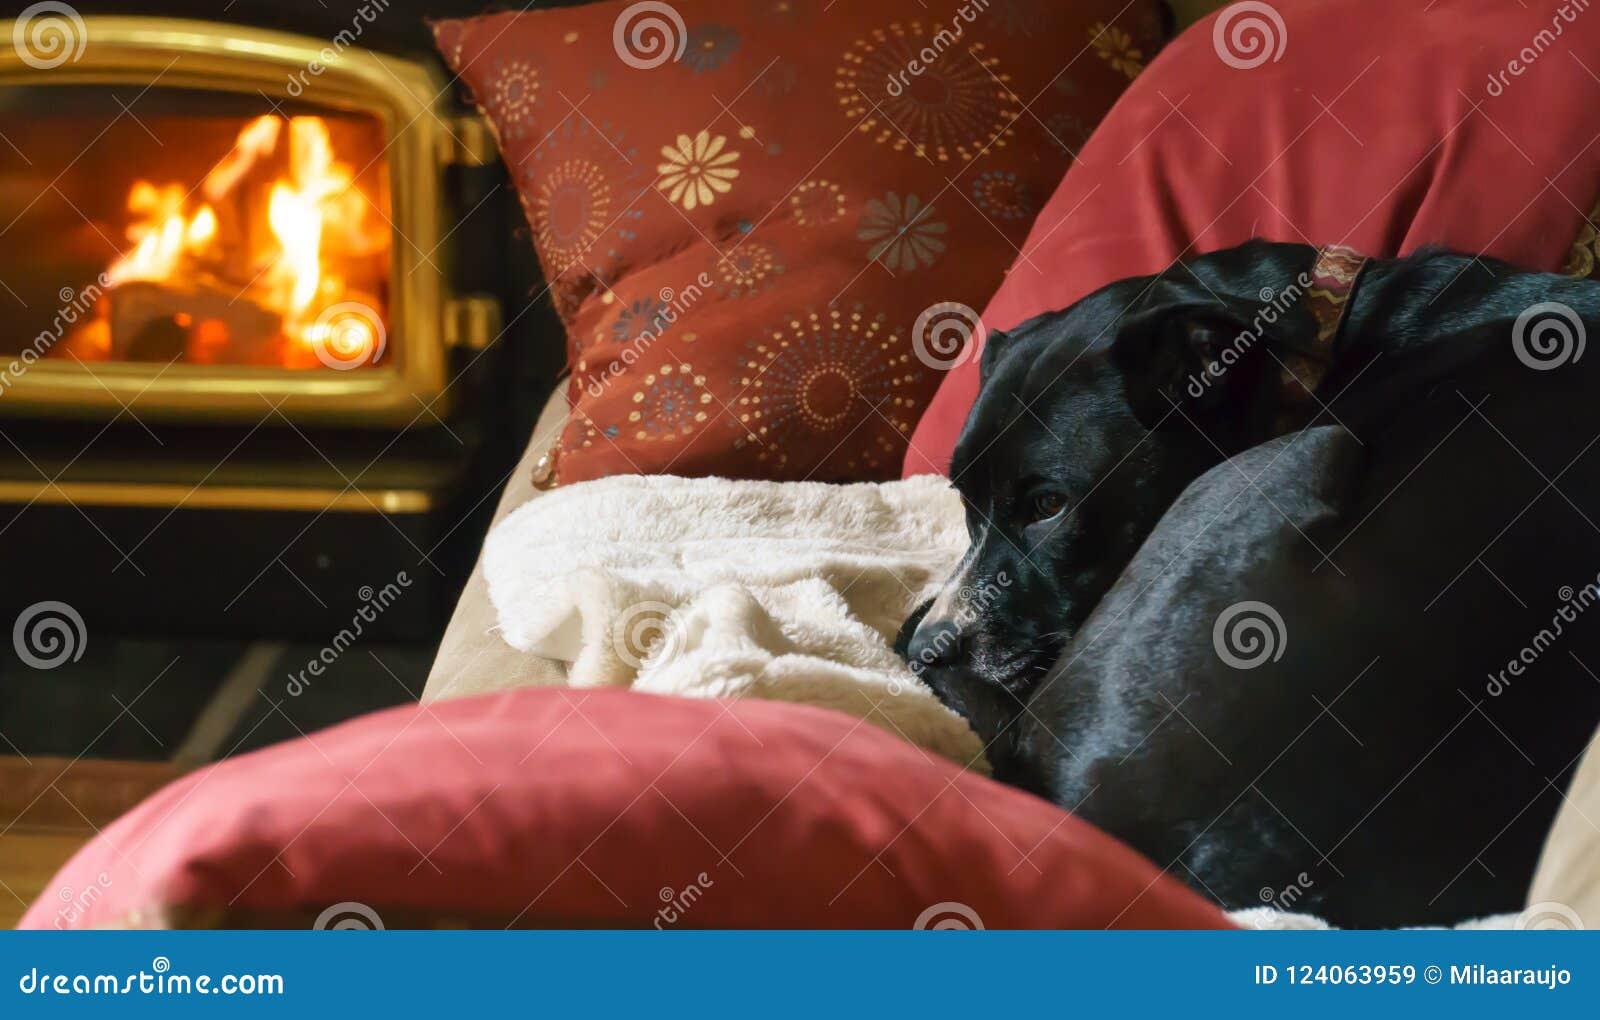 cozy dog near fireplace stock image image of happy 124063959 rh dreamstime com Cozy Fireplace Scene Cozy Fire